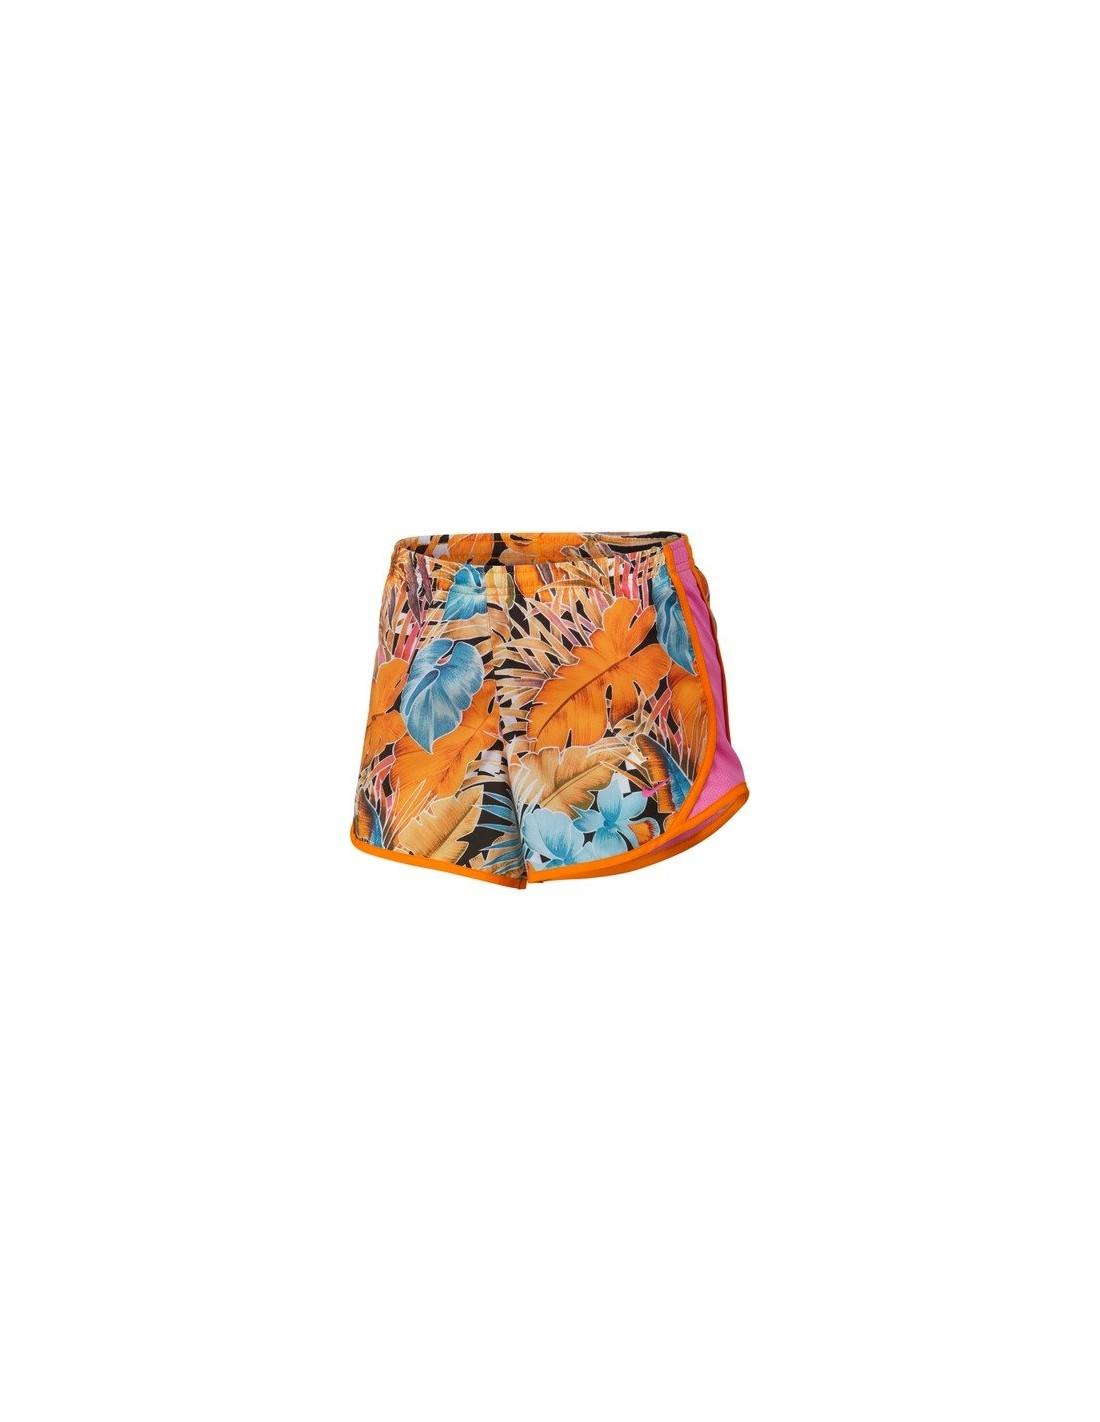 Piratbukser & Shorts Damer Nike Dri-Fit Tempo Printed Shorts Dame AV6378 299 kr